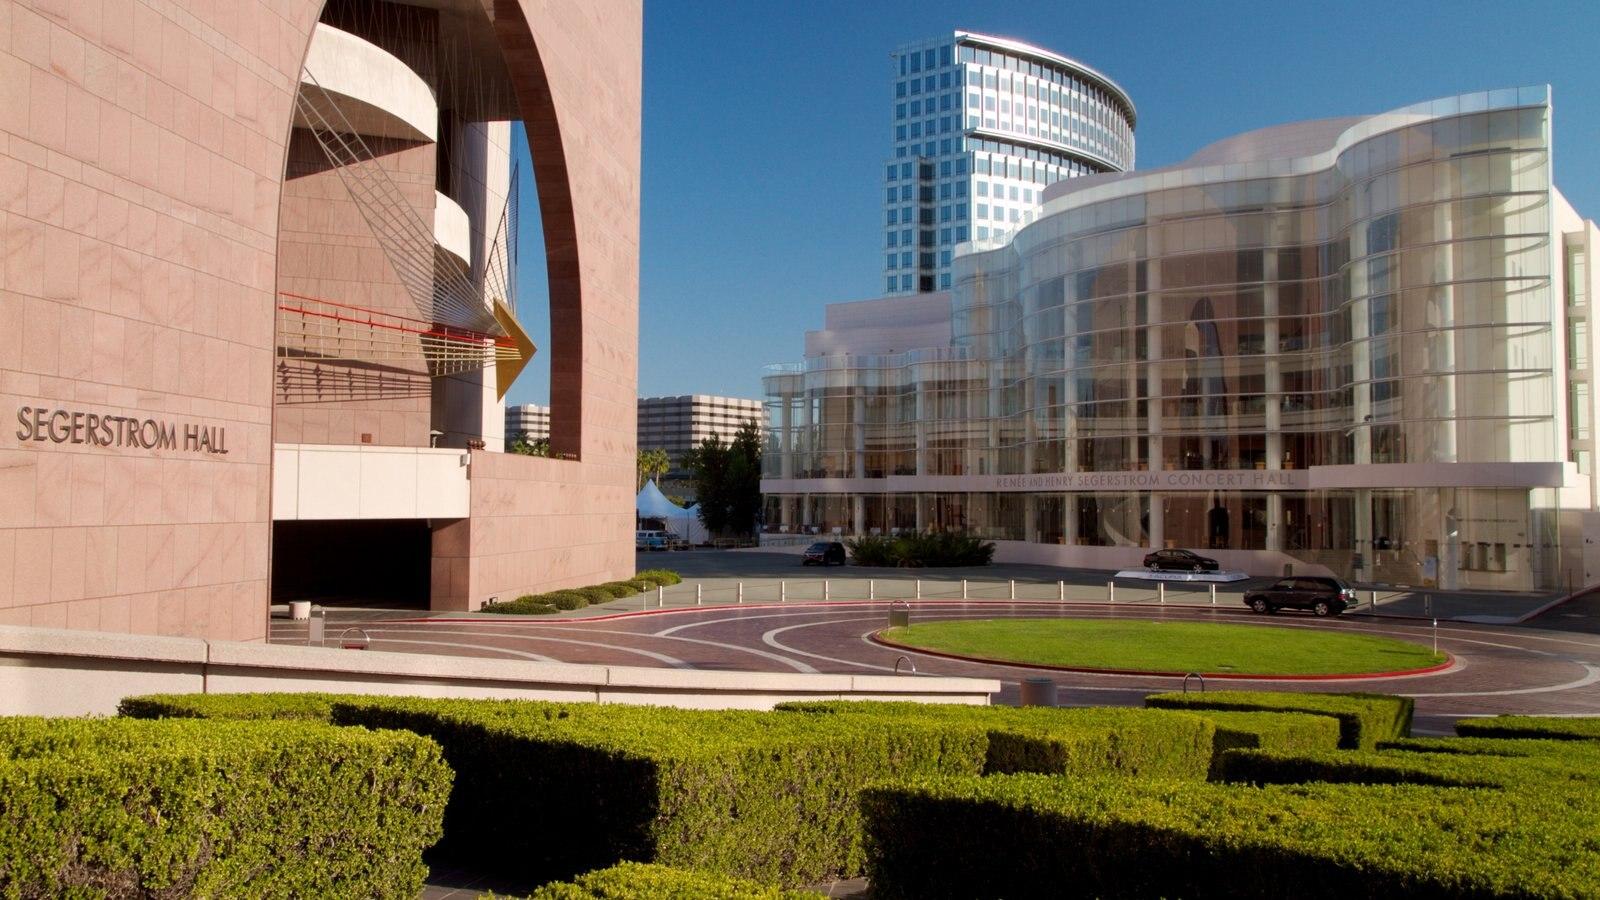 Segerstrom Center for the Arts mostrando una ciudad, un parque o plaza y arquitectura moderna